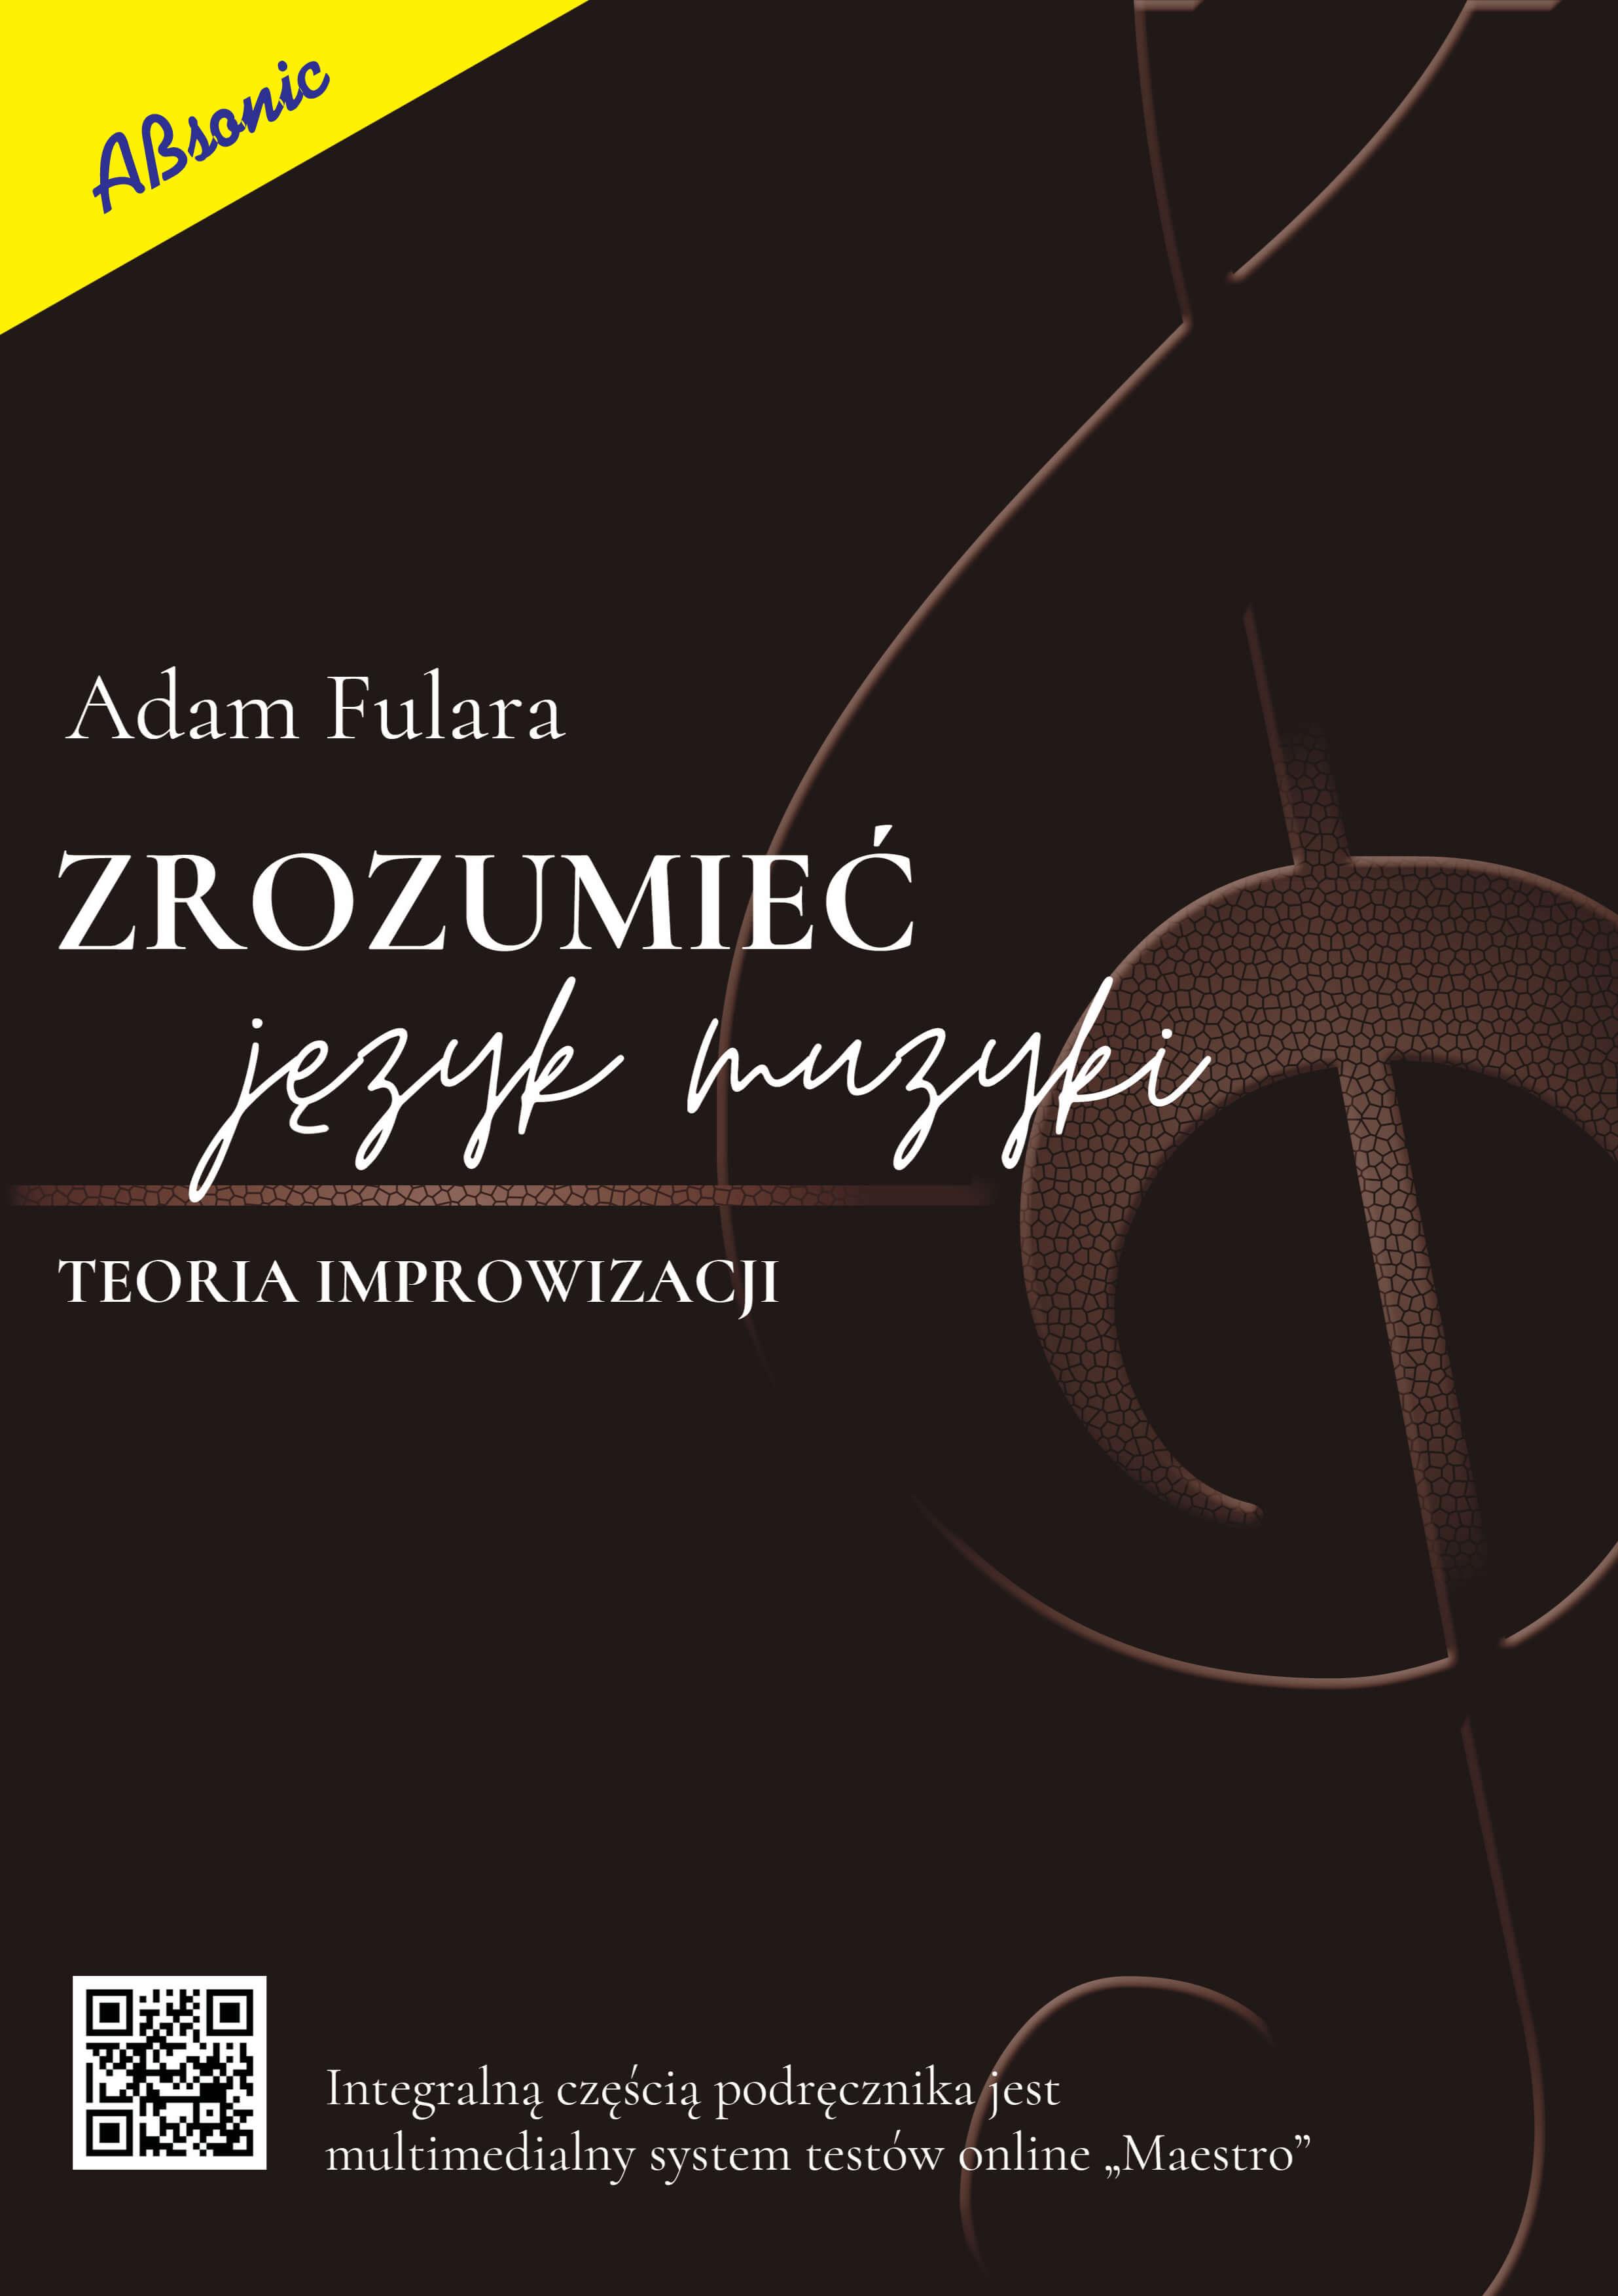 Improvisation theory book by Adam Fulara